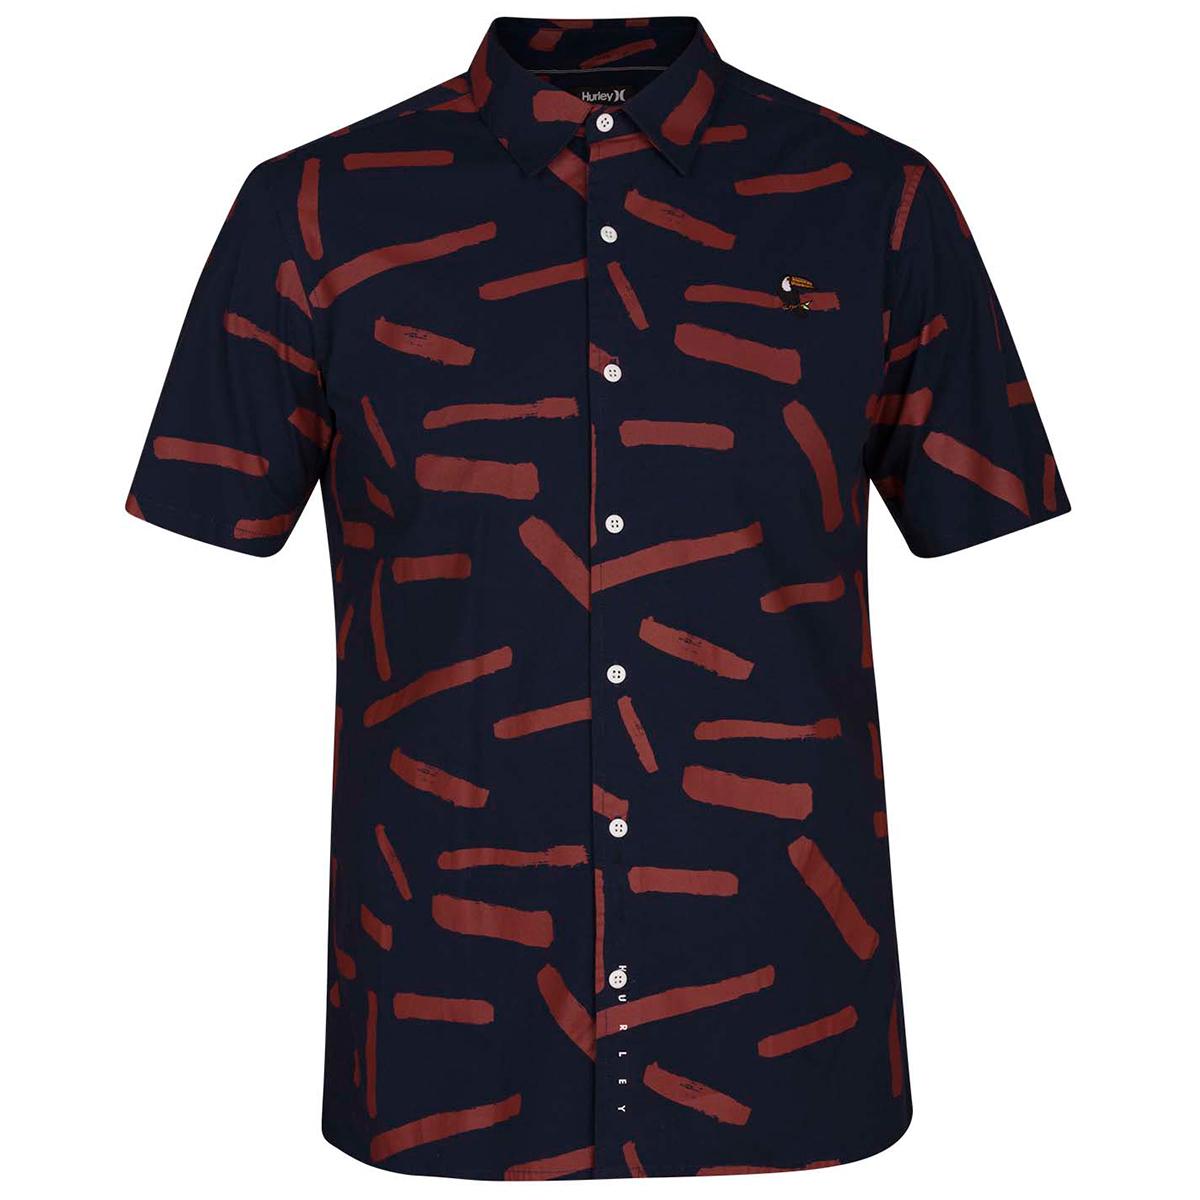 Hurley Men's Bowie Short-Sleeve Shirt - Blue, M